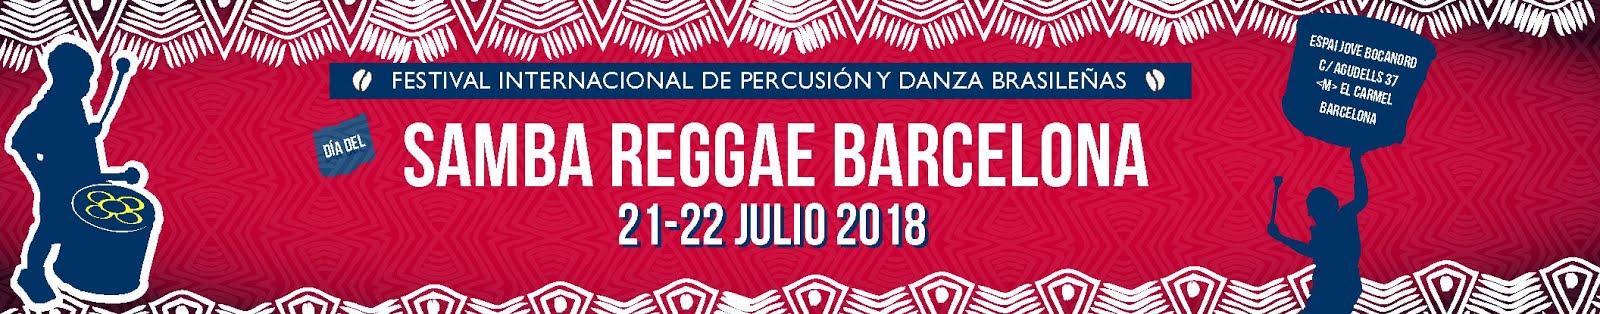 Día del Samba Reggae en Barcelona